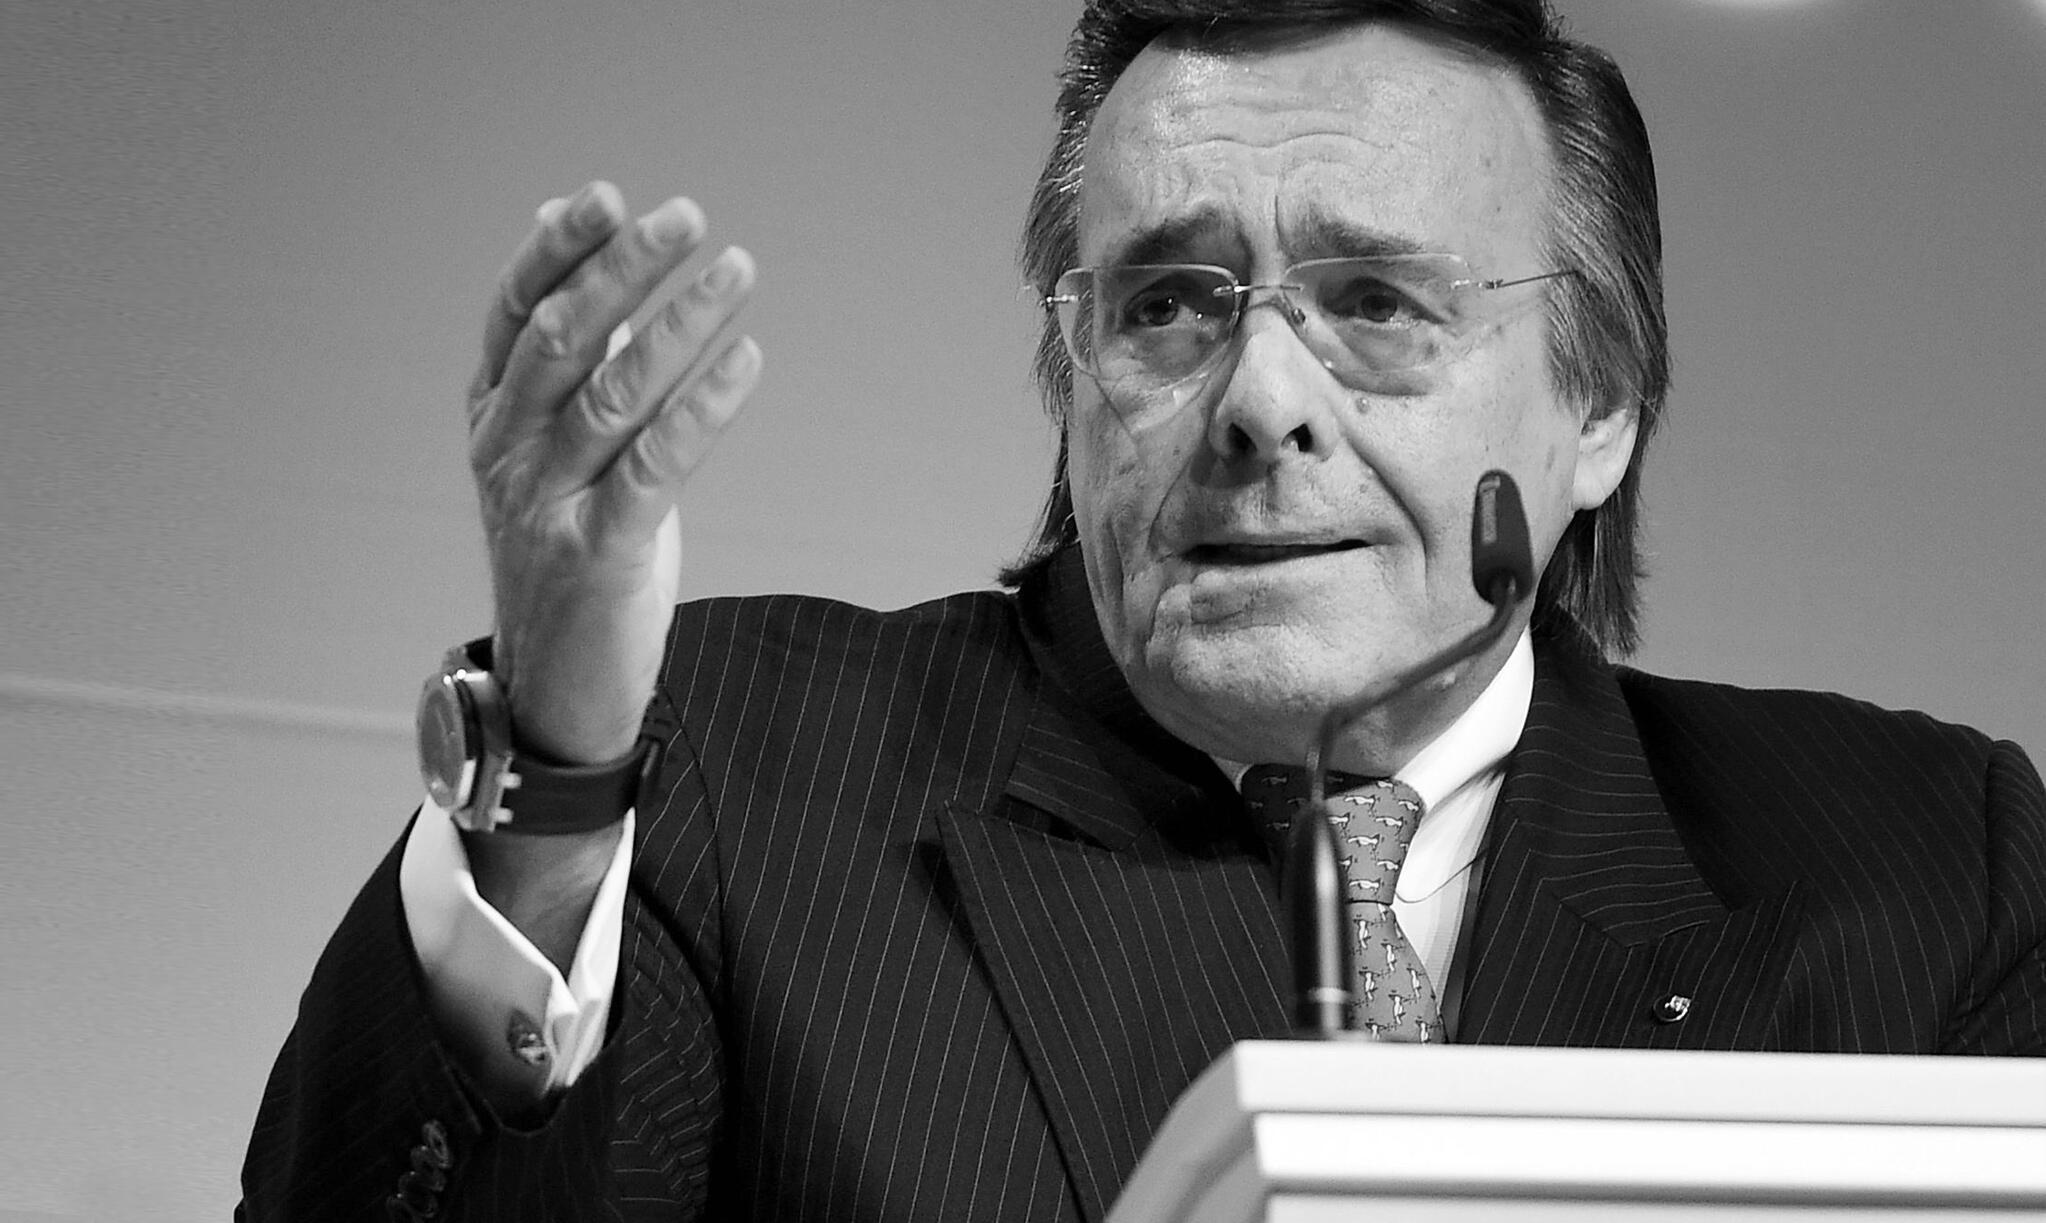 Bild zu Mittelstandspräsident Mario Ohoven stirbt bei Verkehrsunfall